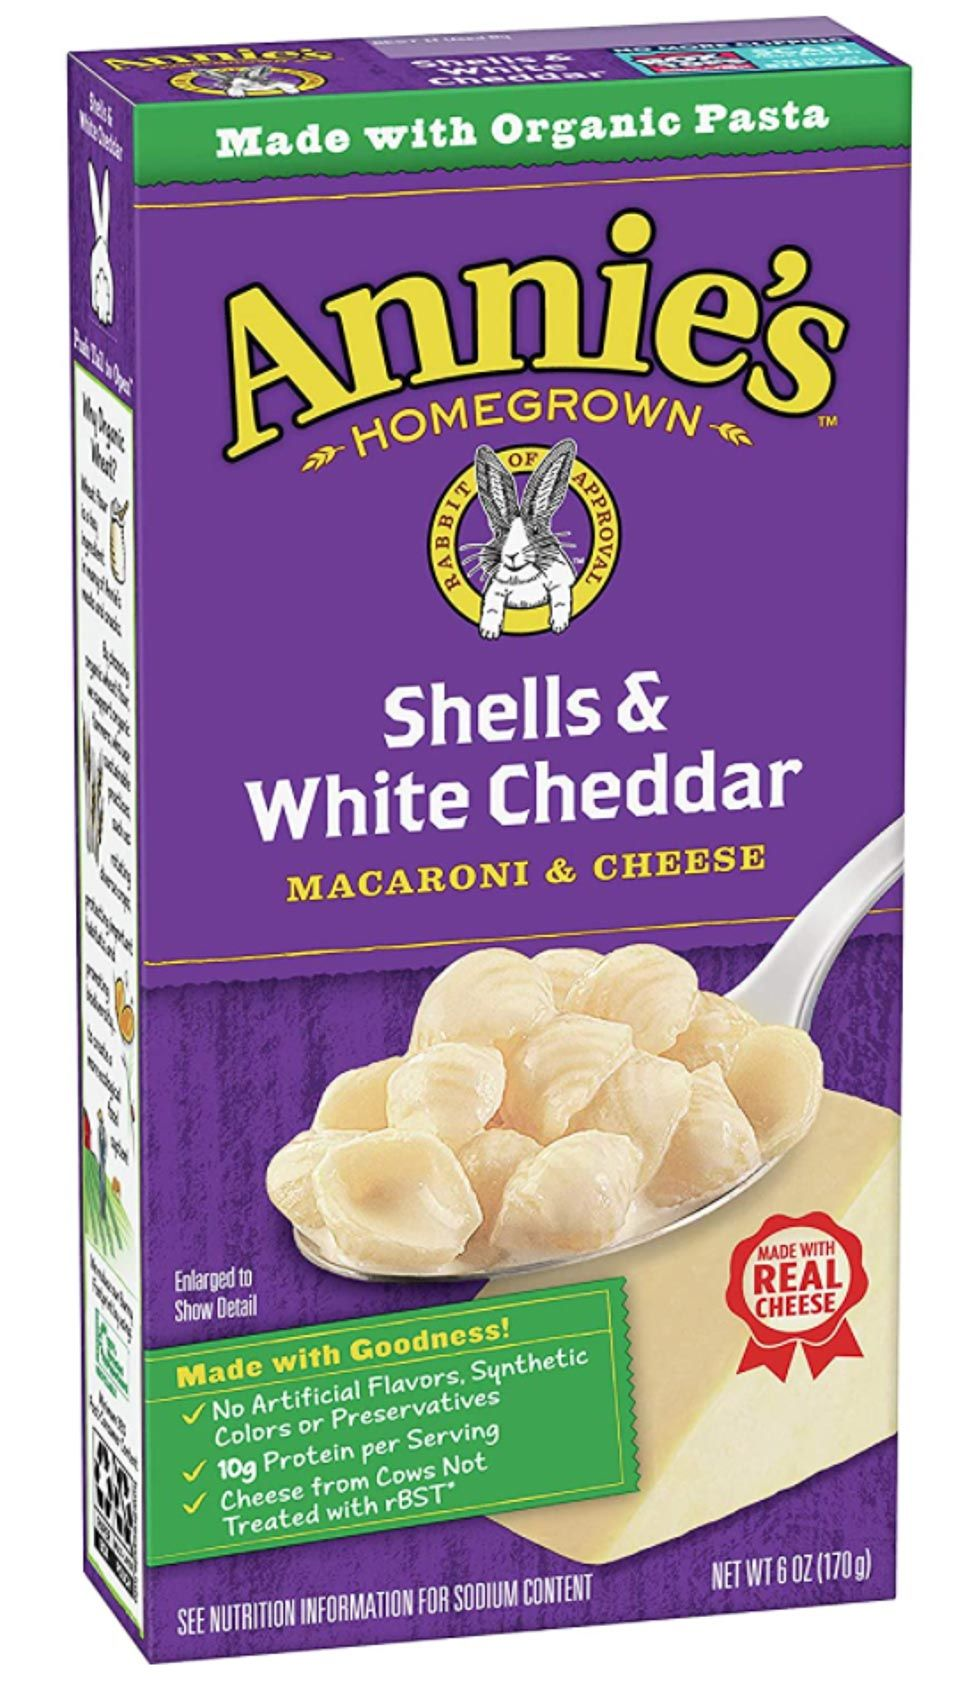 annies_shells_white_cheddar_macaroni_cheese.jpg